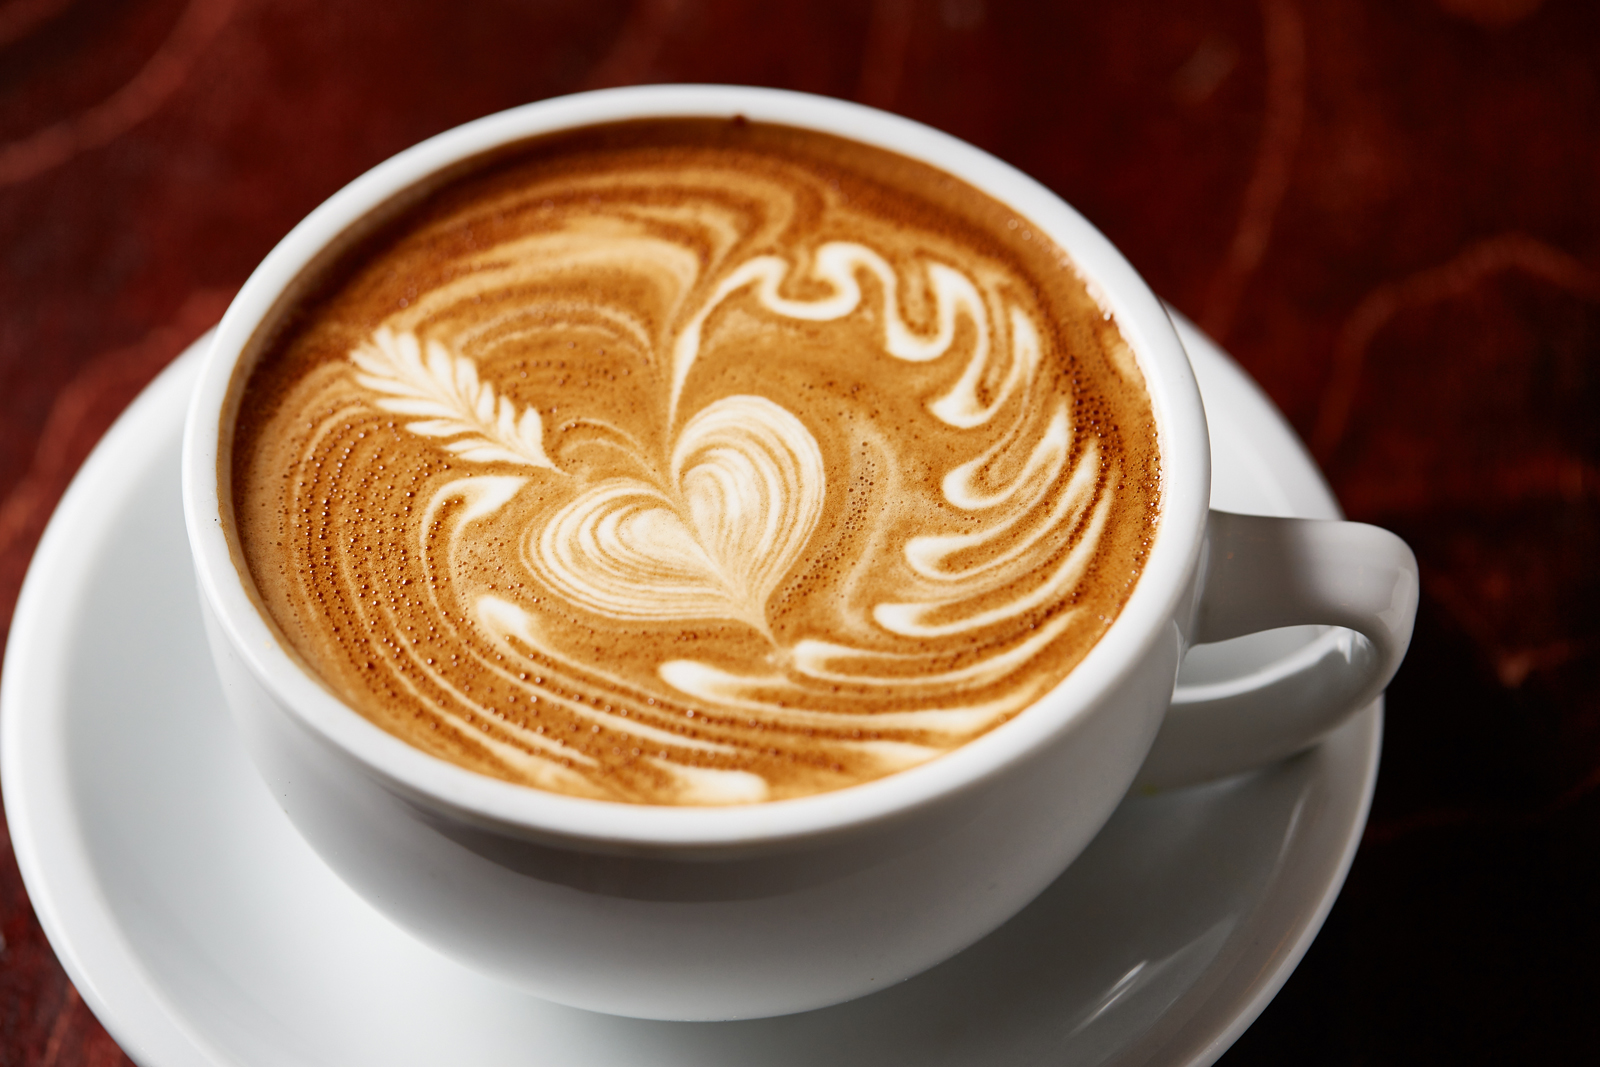 sawada-coffee-10dec2015-0031